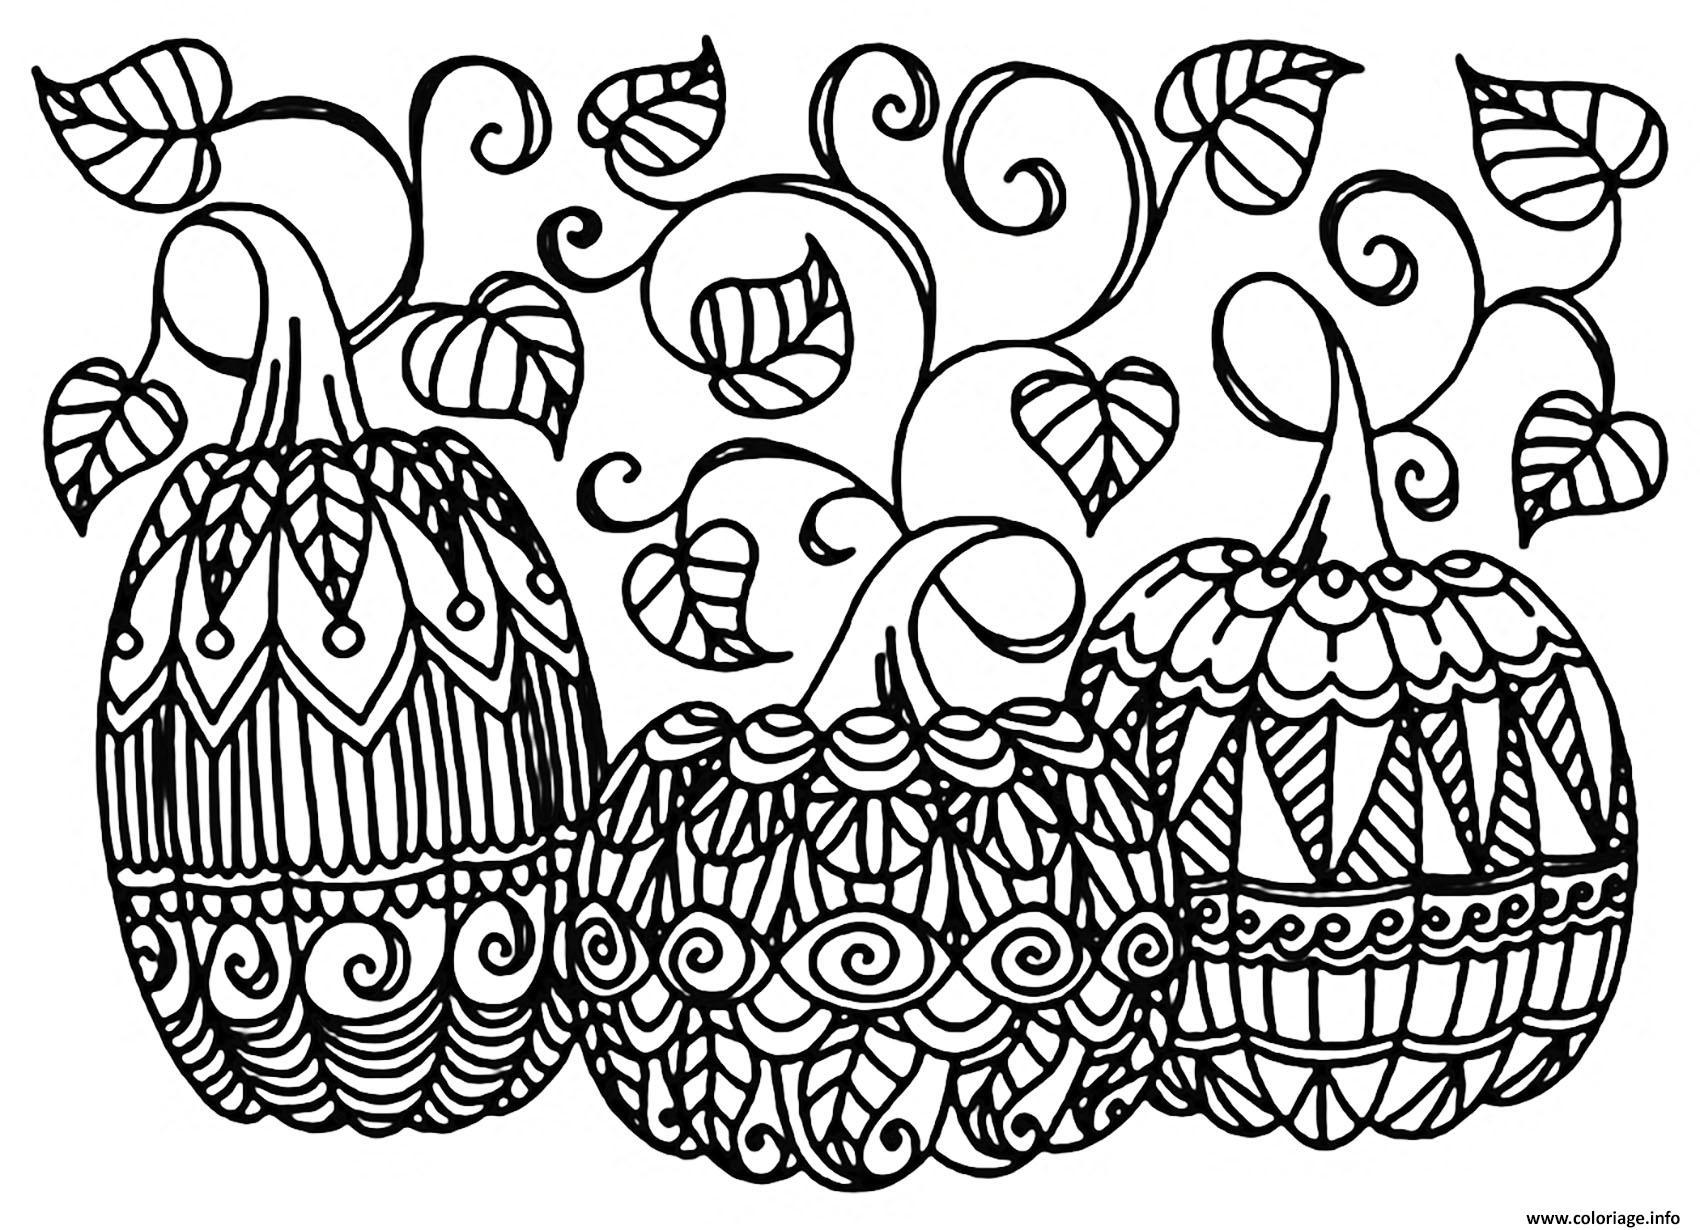 Inspirant Dessin Halloween Citrouille A Imprimer Gratuit